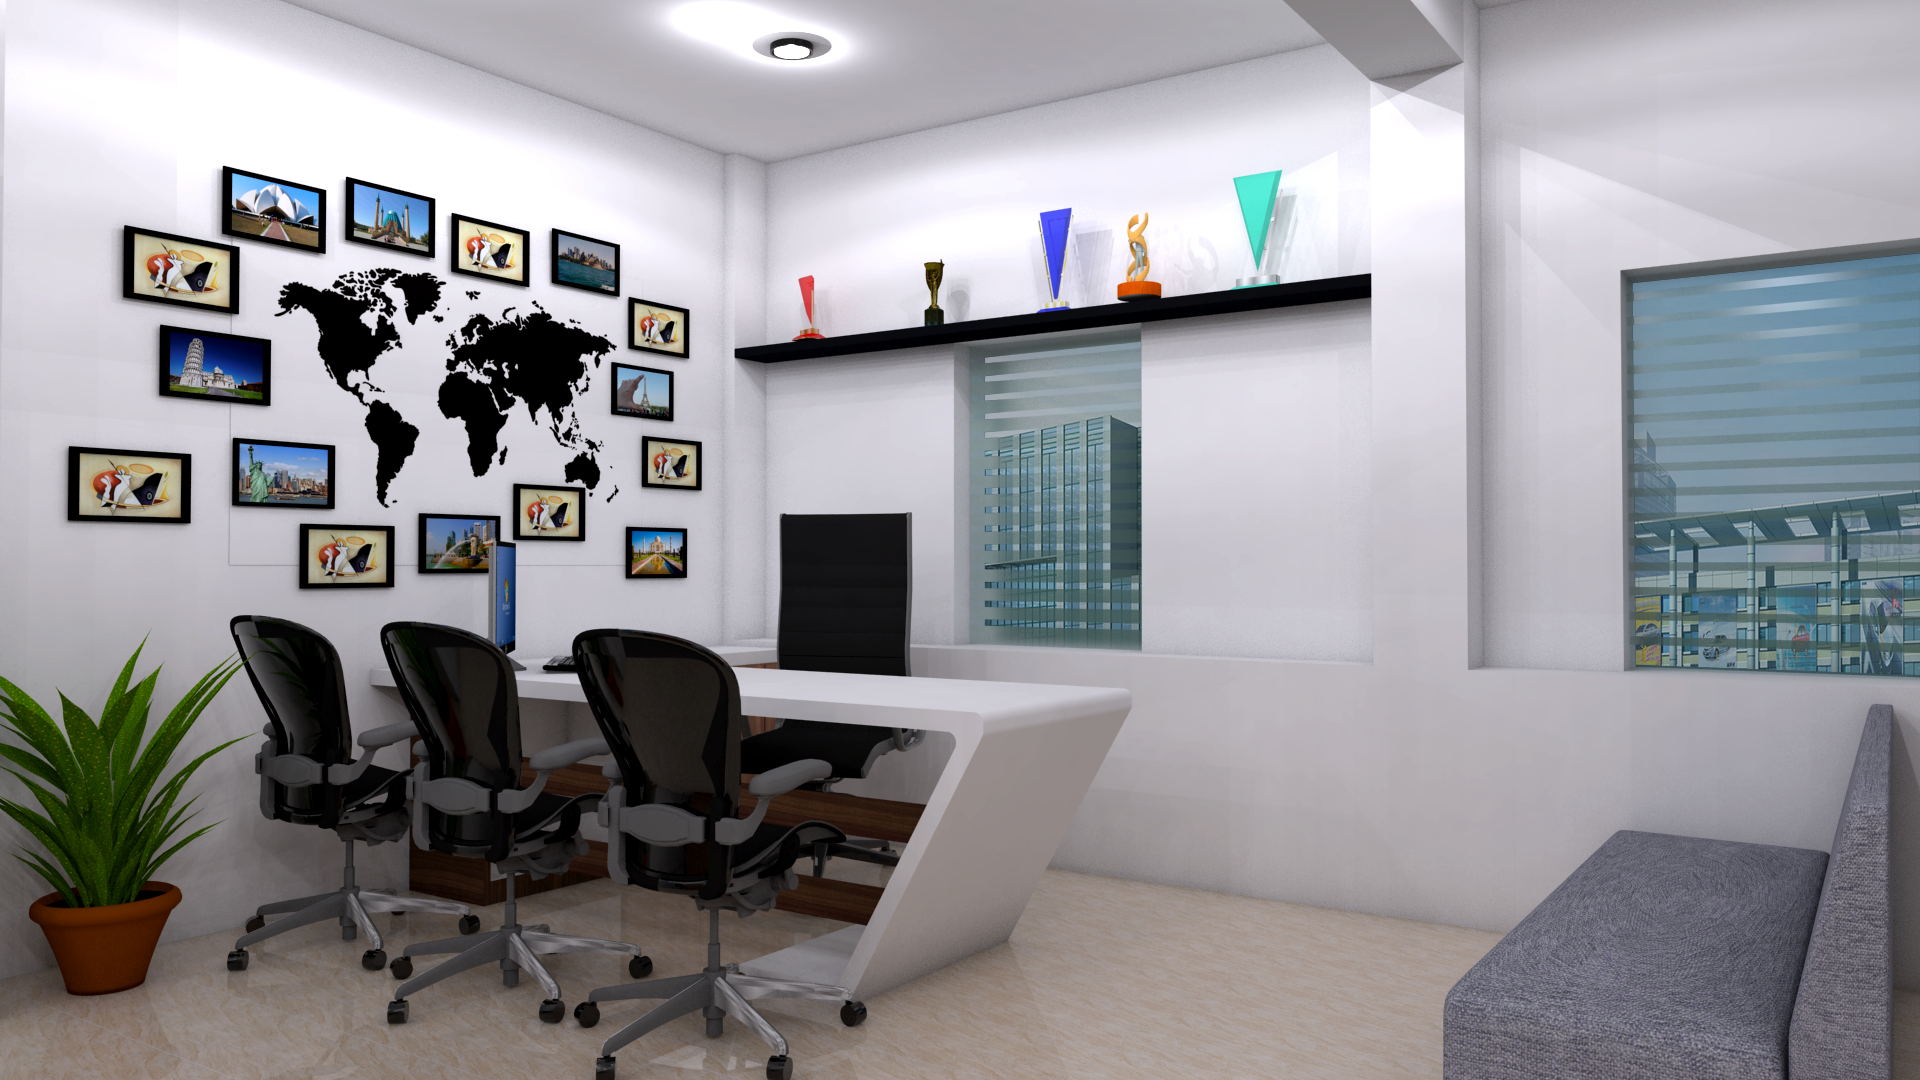 Tours And Travels Office Design Cafe Interior Design Cafe